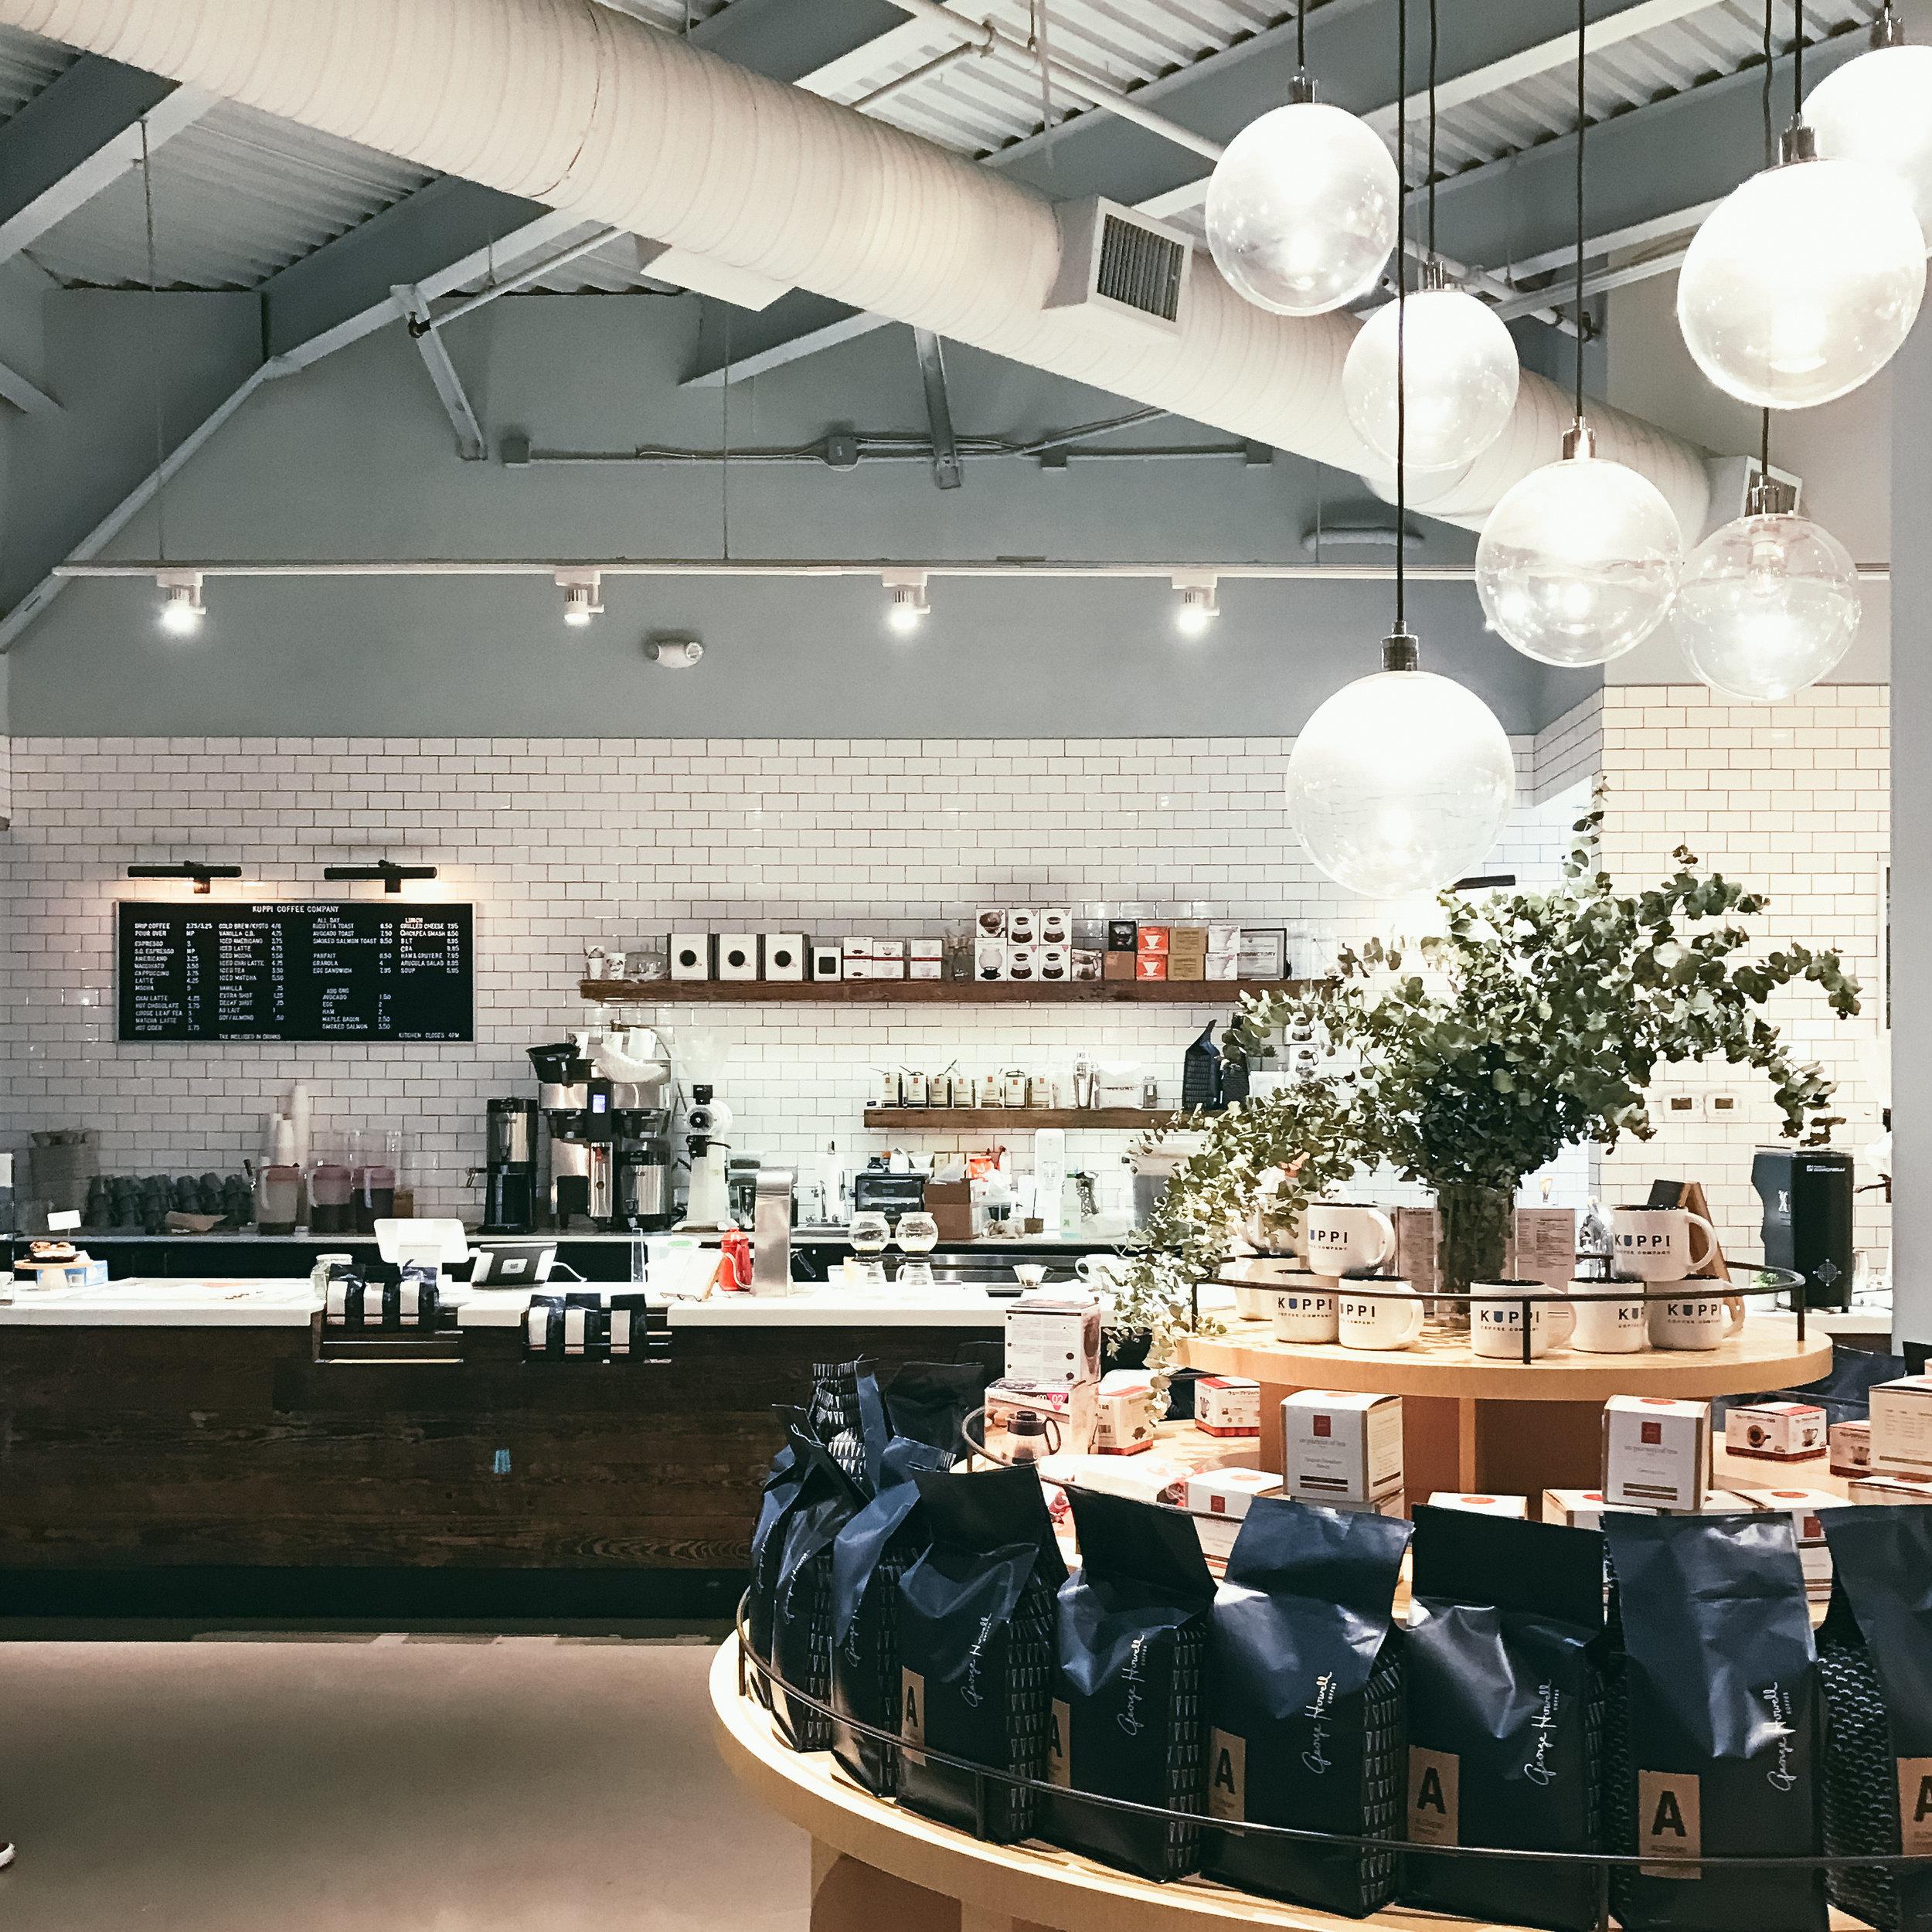 Kuppi Coffee // 725 River Rd, Edgewater, NJ 07020